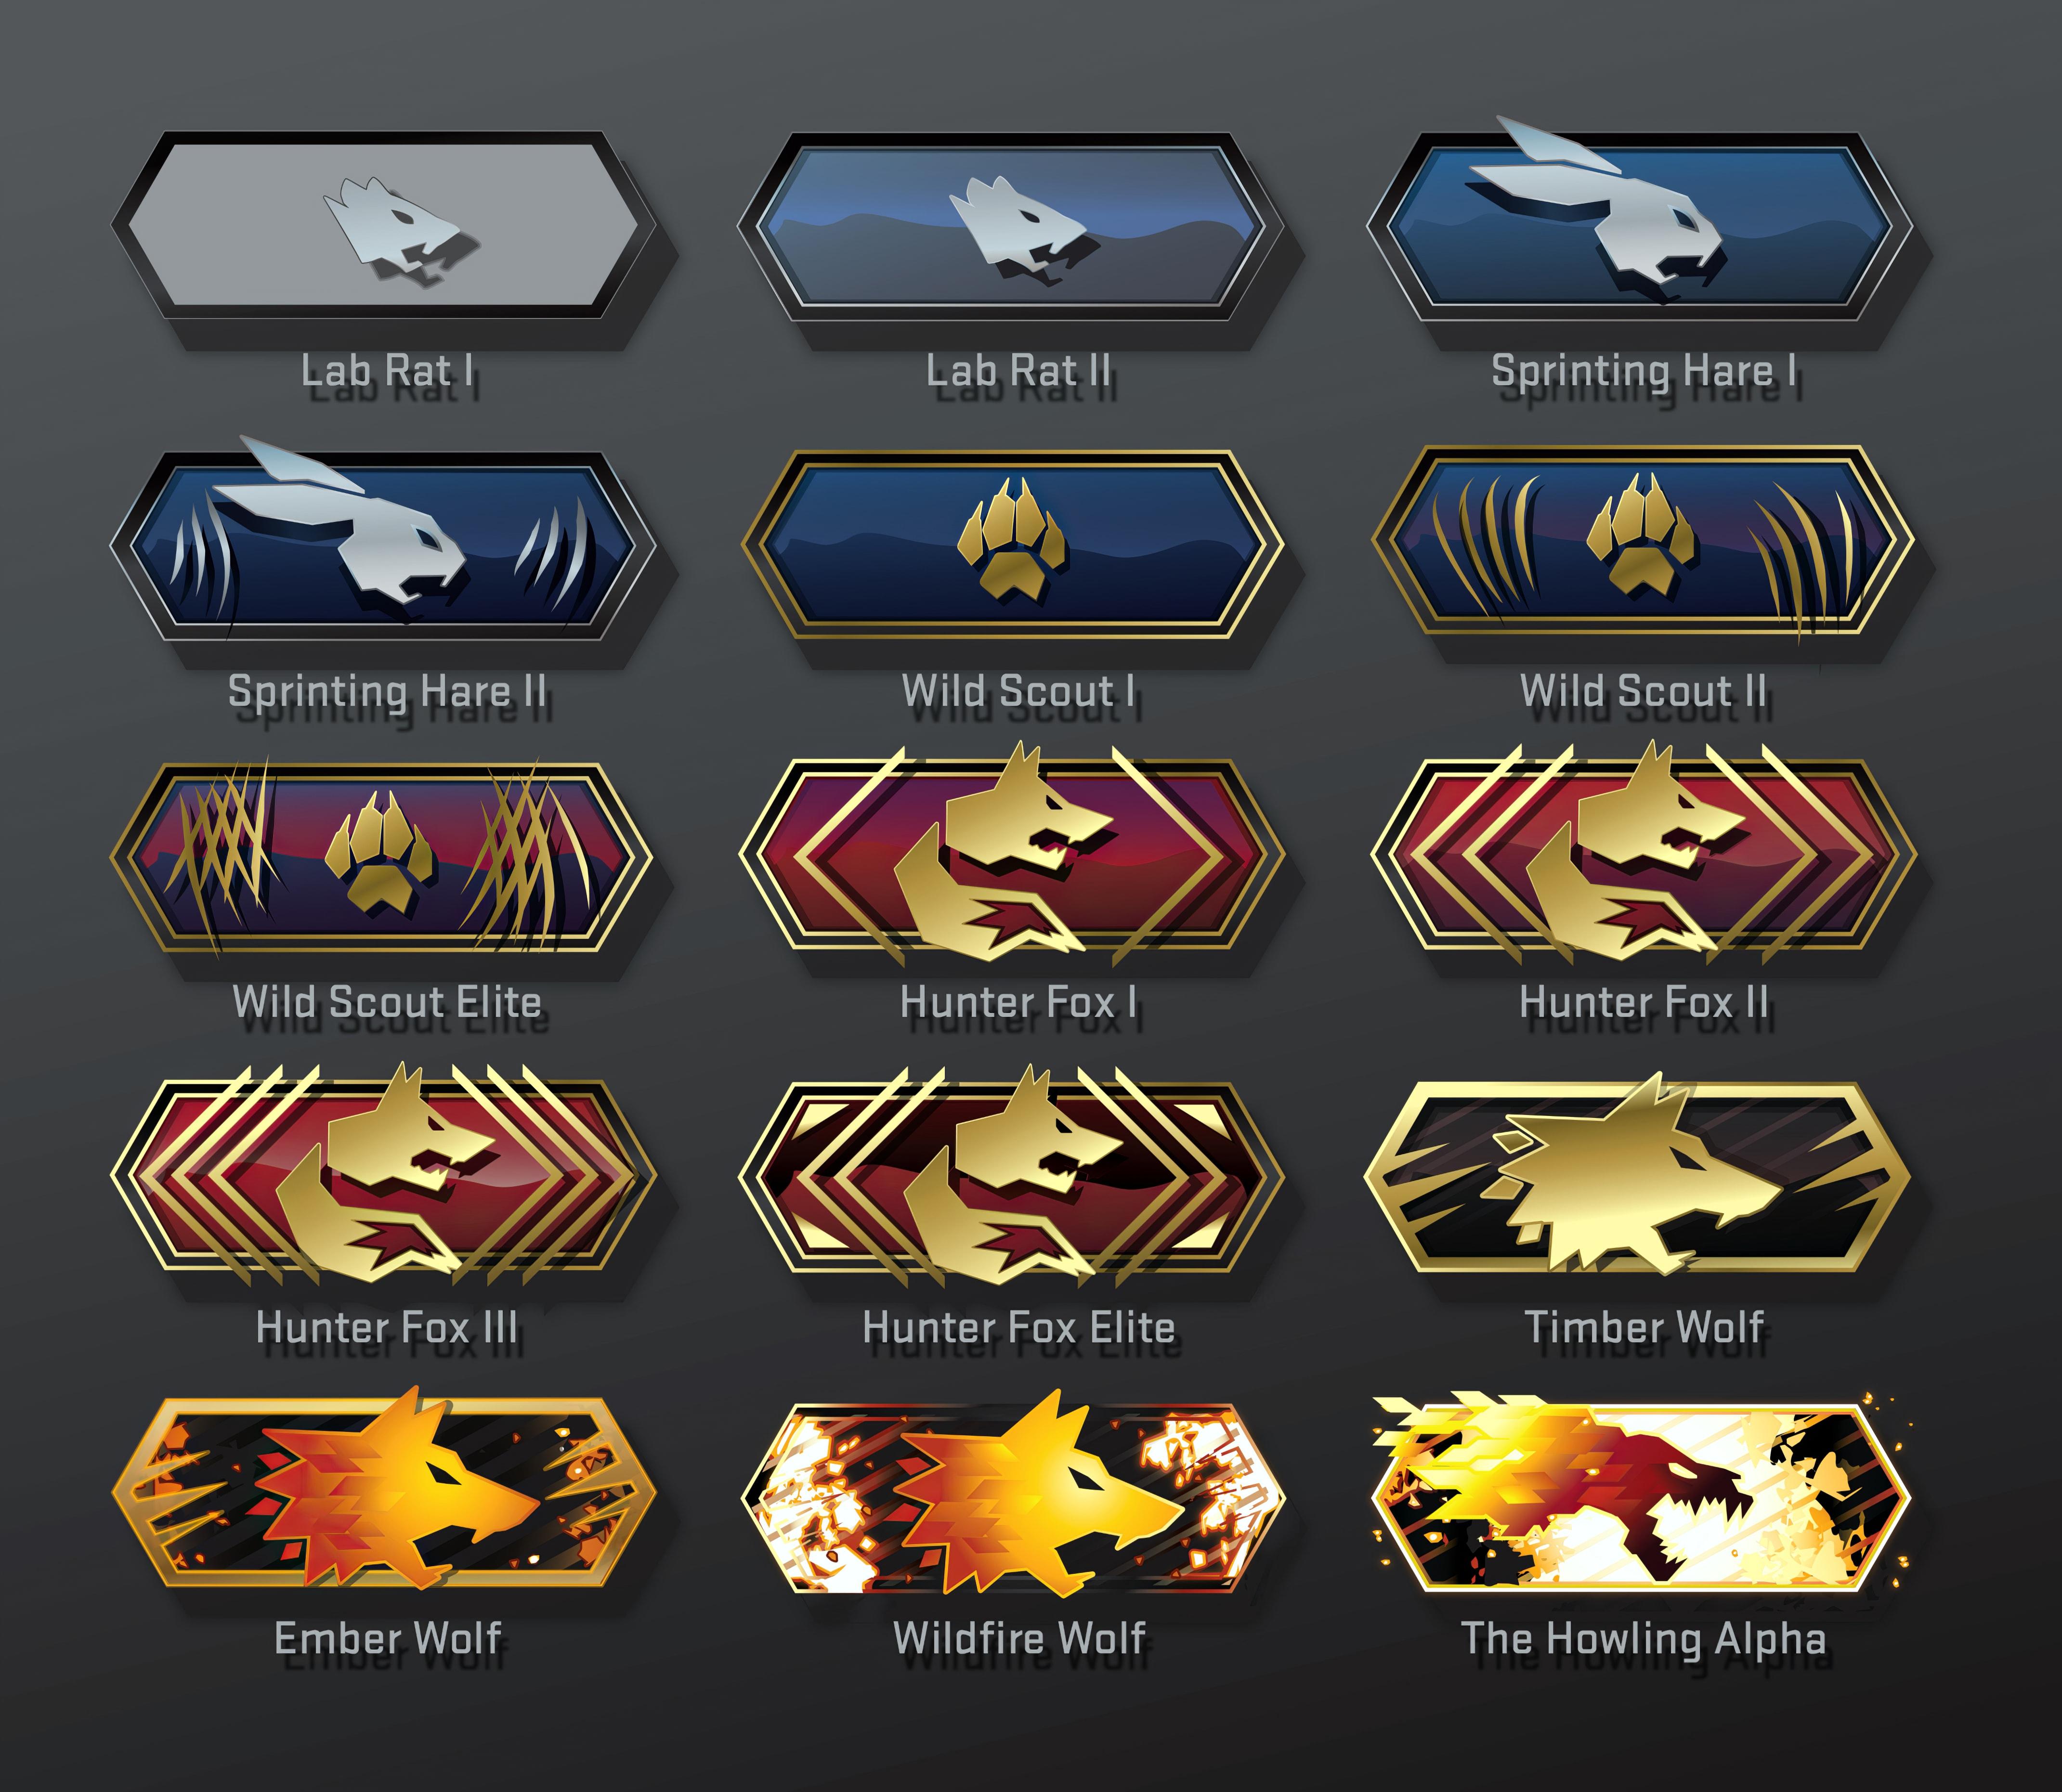 CS:GO skill groups in Danger Zone